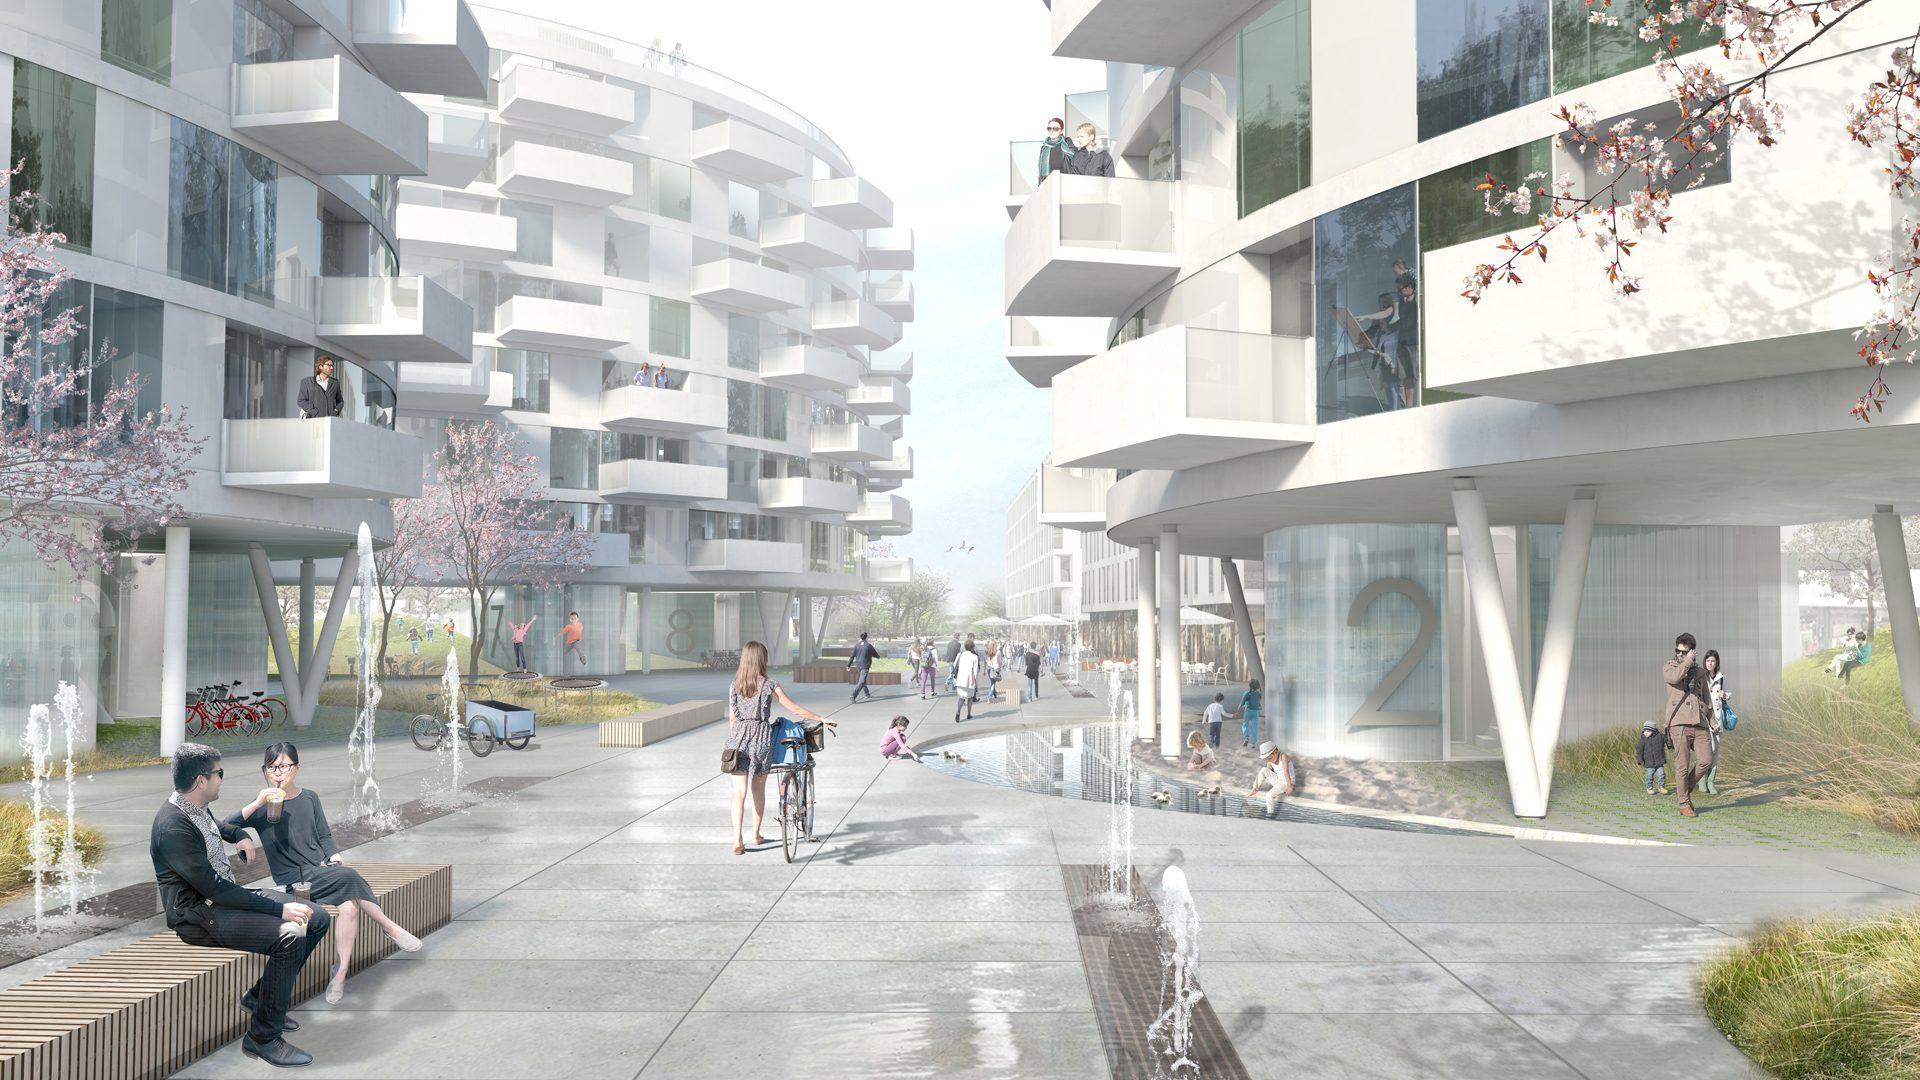 ZESO 城市与住宅 / Rådhushaven